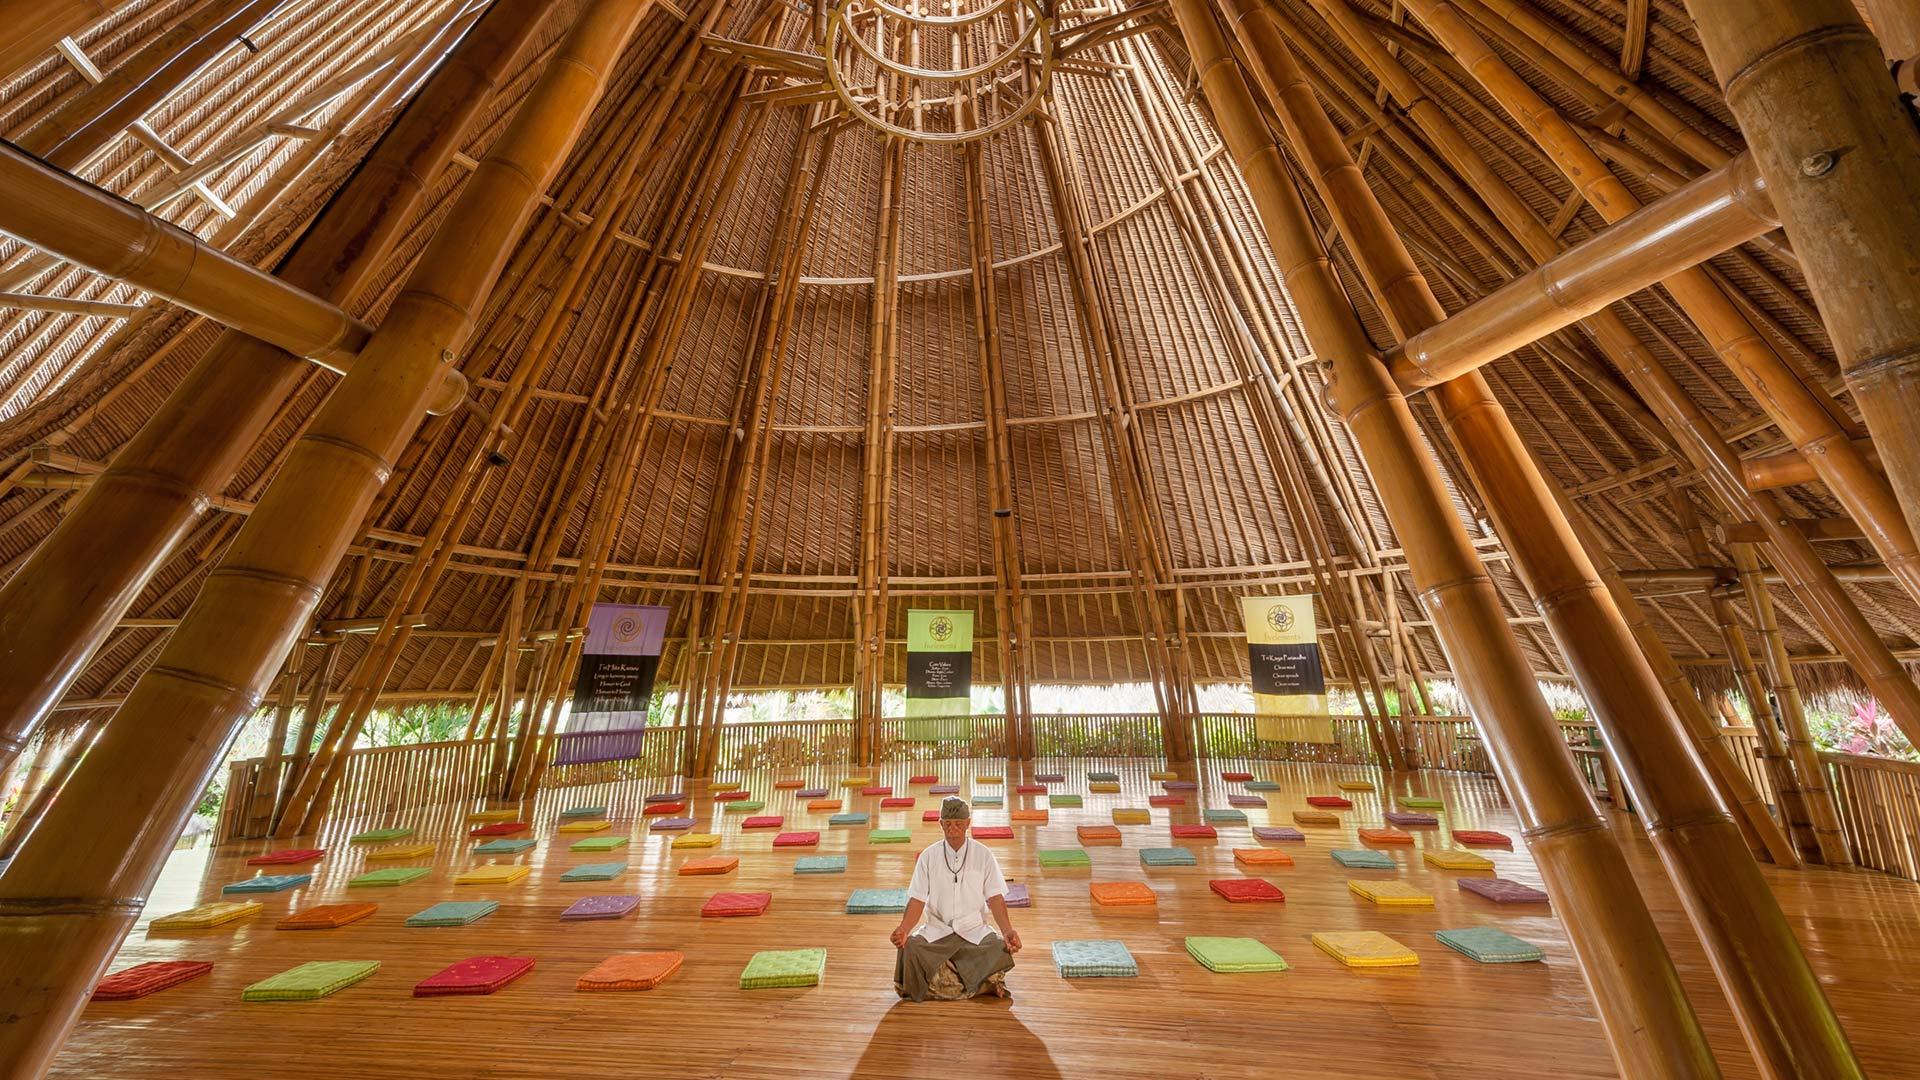 Fivelements wellness retreat in Bali